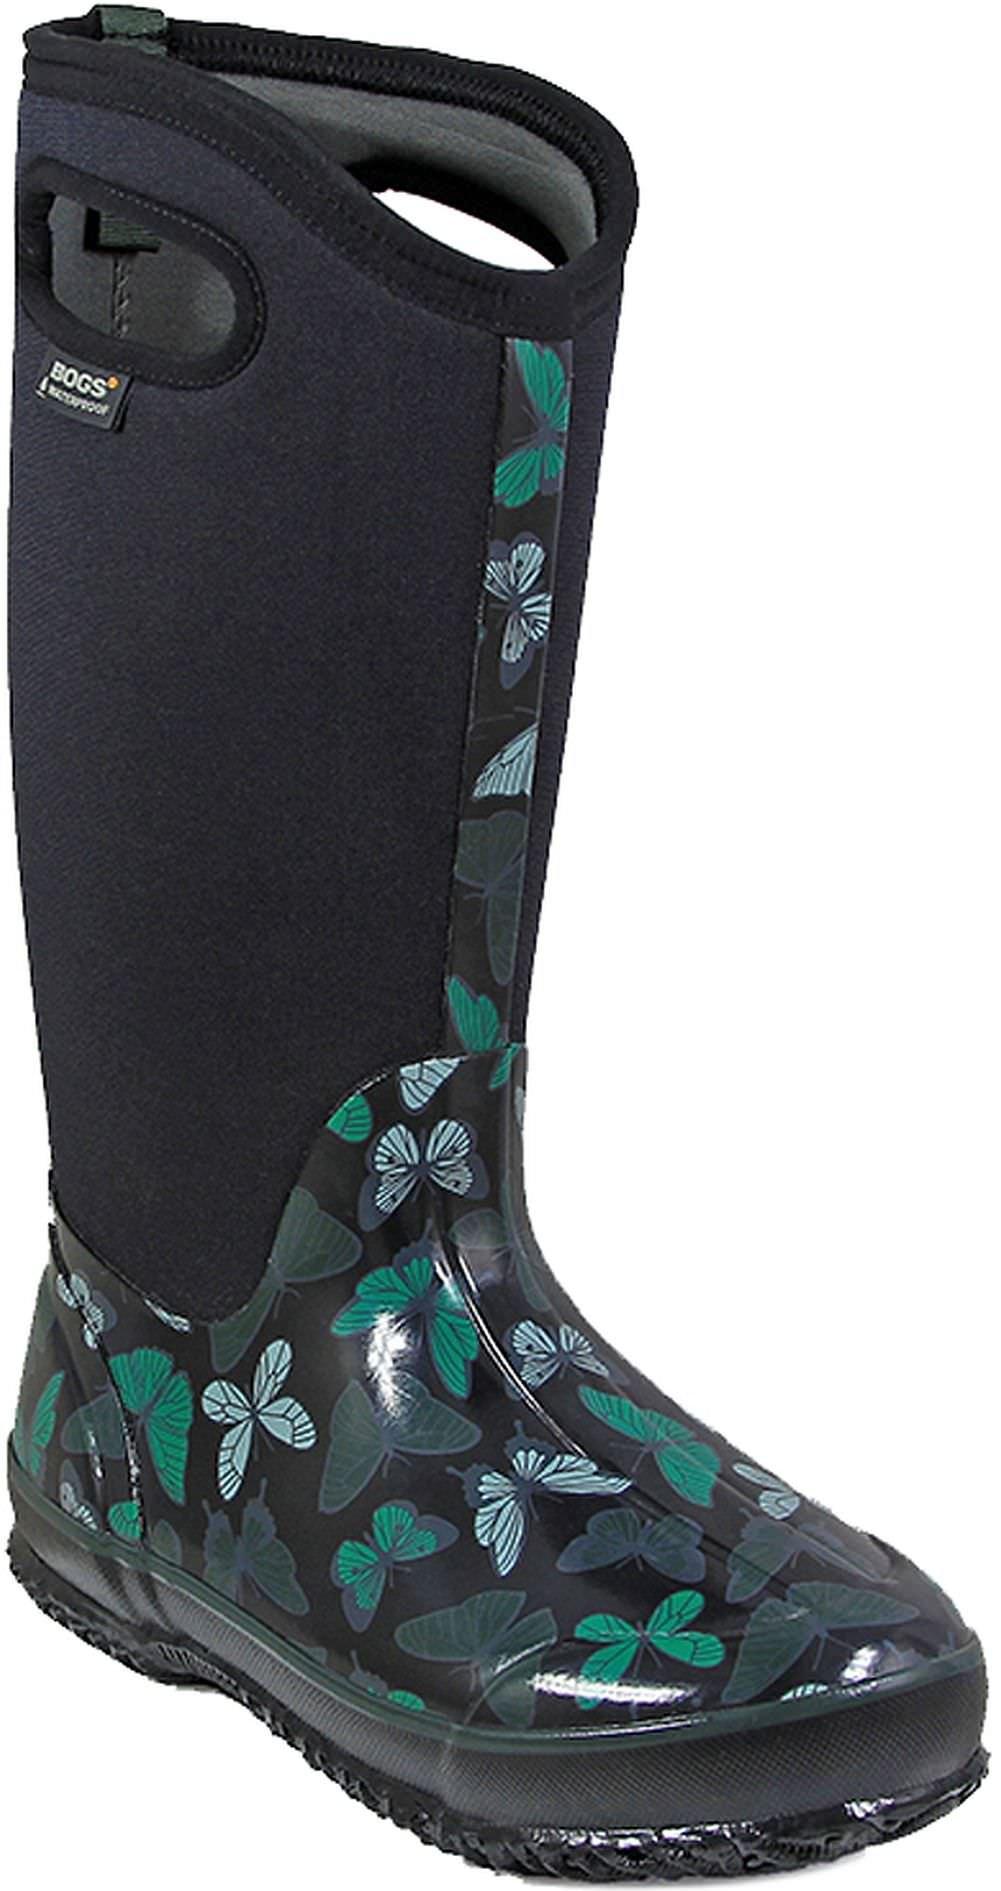 Bogs Women's Classic Butterflies Snow Boot, Black/Multi, 6 M US